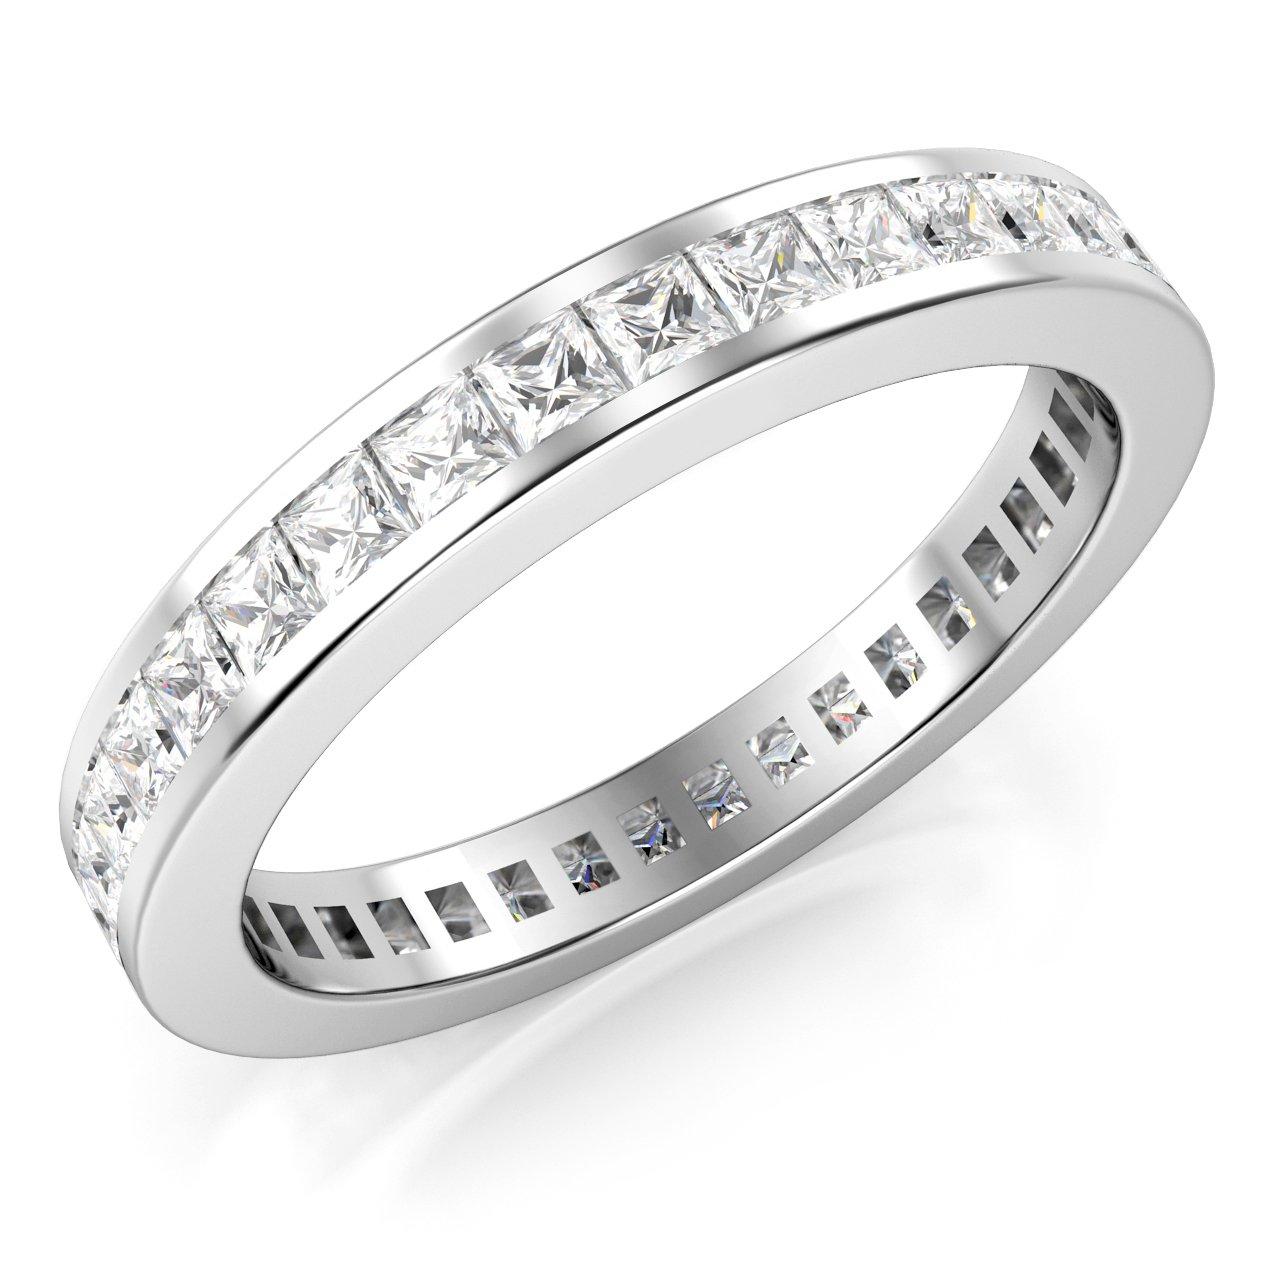 3MM Sterling Silver Princess Cut CZ Eternity Cubic Zirconia Ring Metal Factory